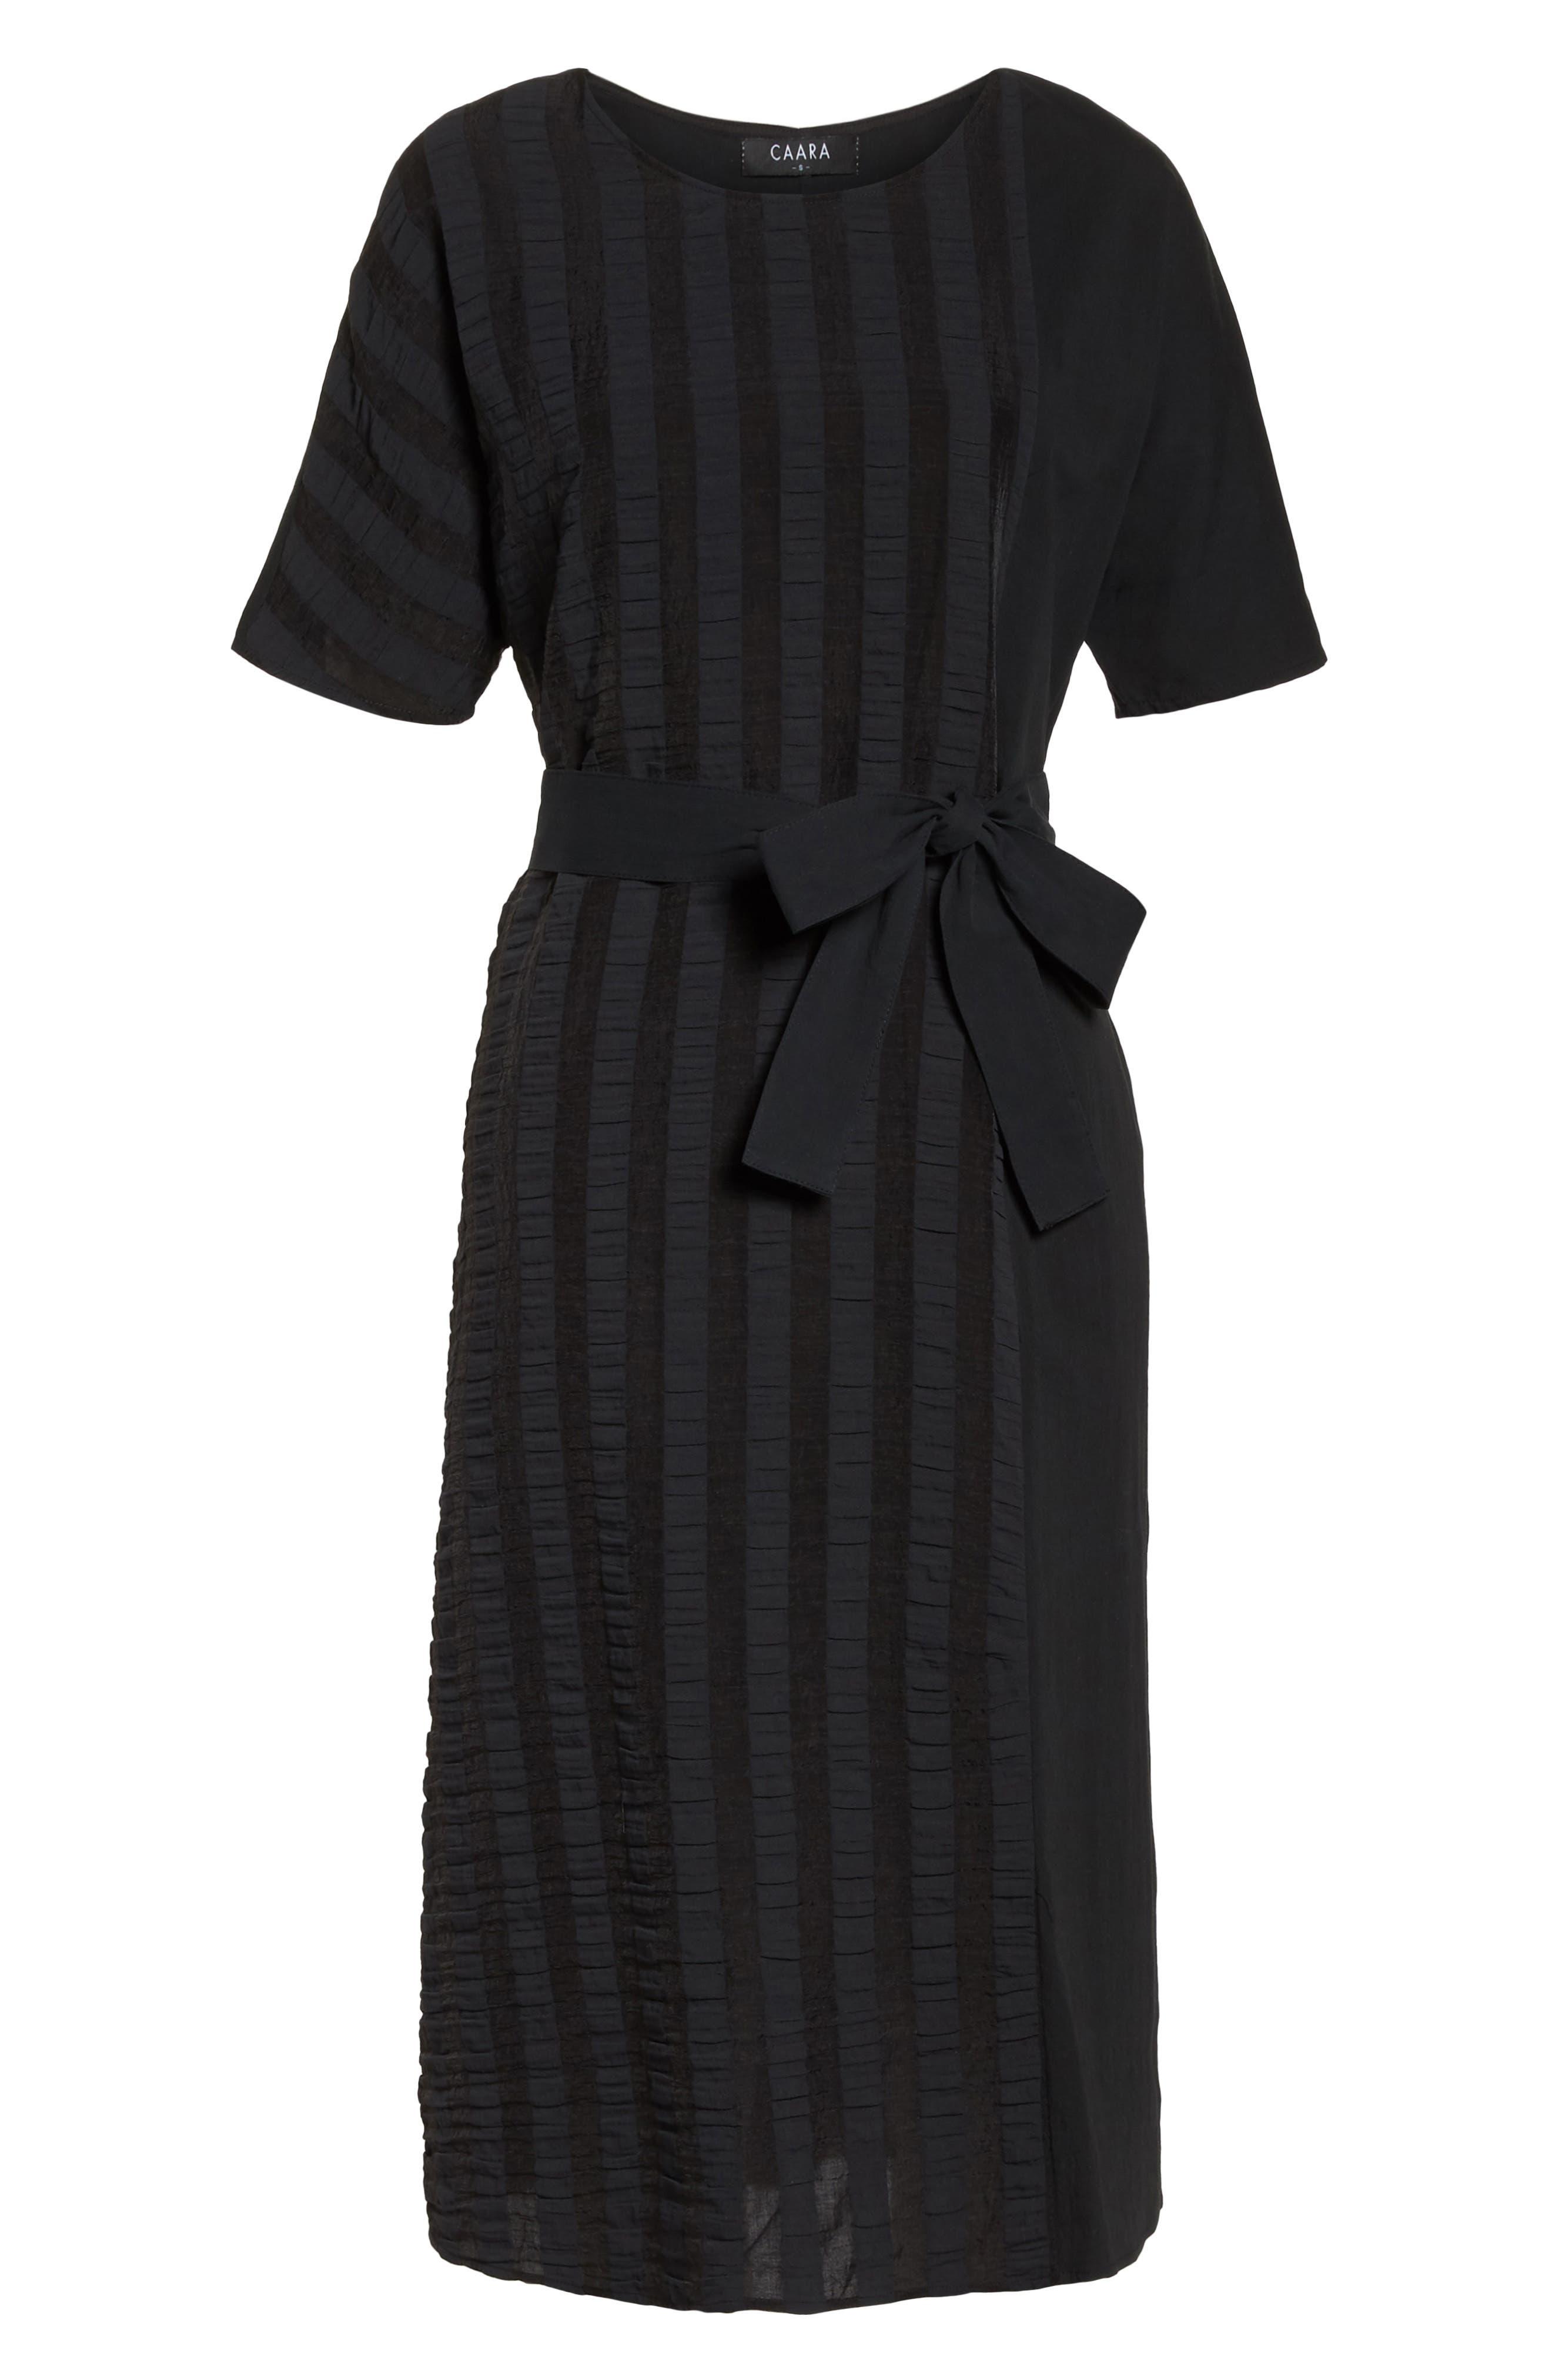 Throwing Shade Midi Dress,                             Alternate thumbnail 7, color,                             Black